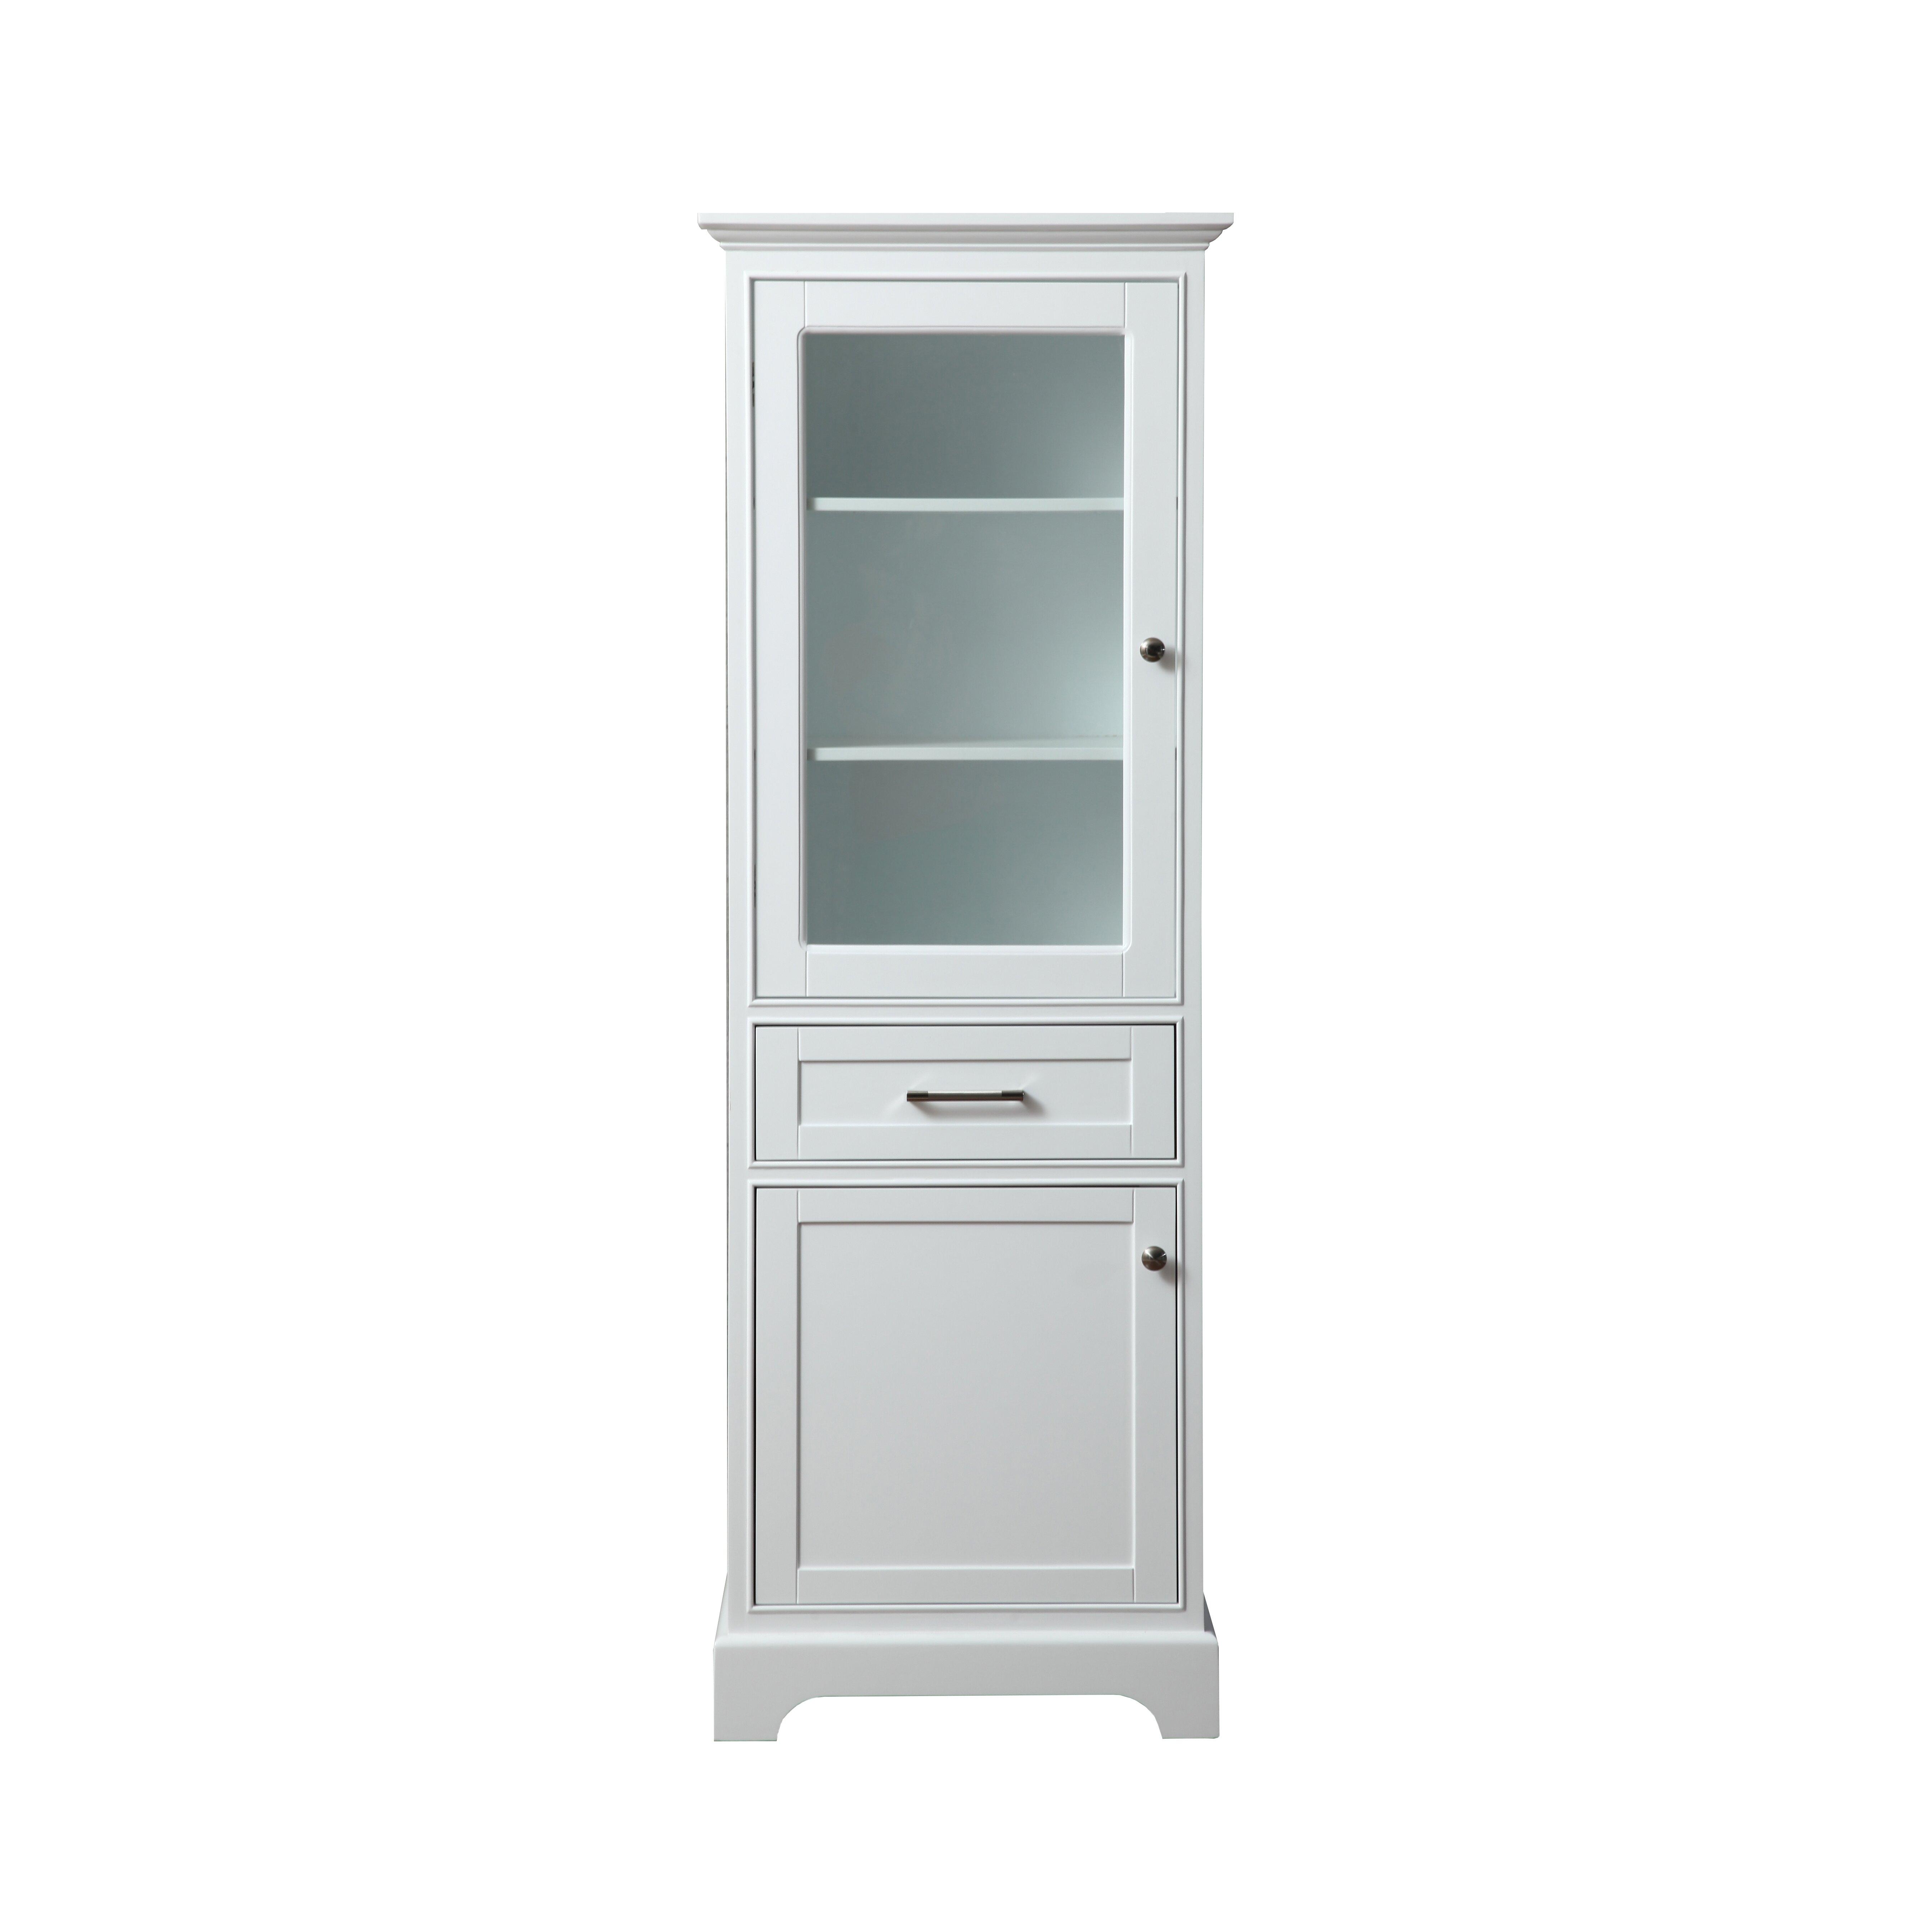 Morgan 24 x 72 free standing linen tower wayfair - Free standing linen cabinets for bathroom ...